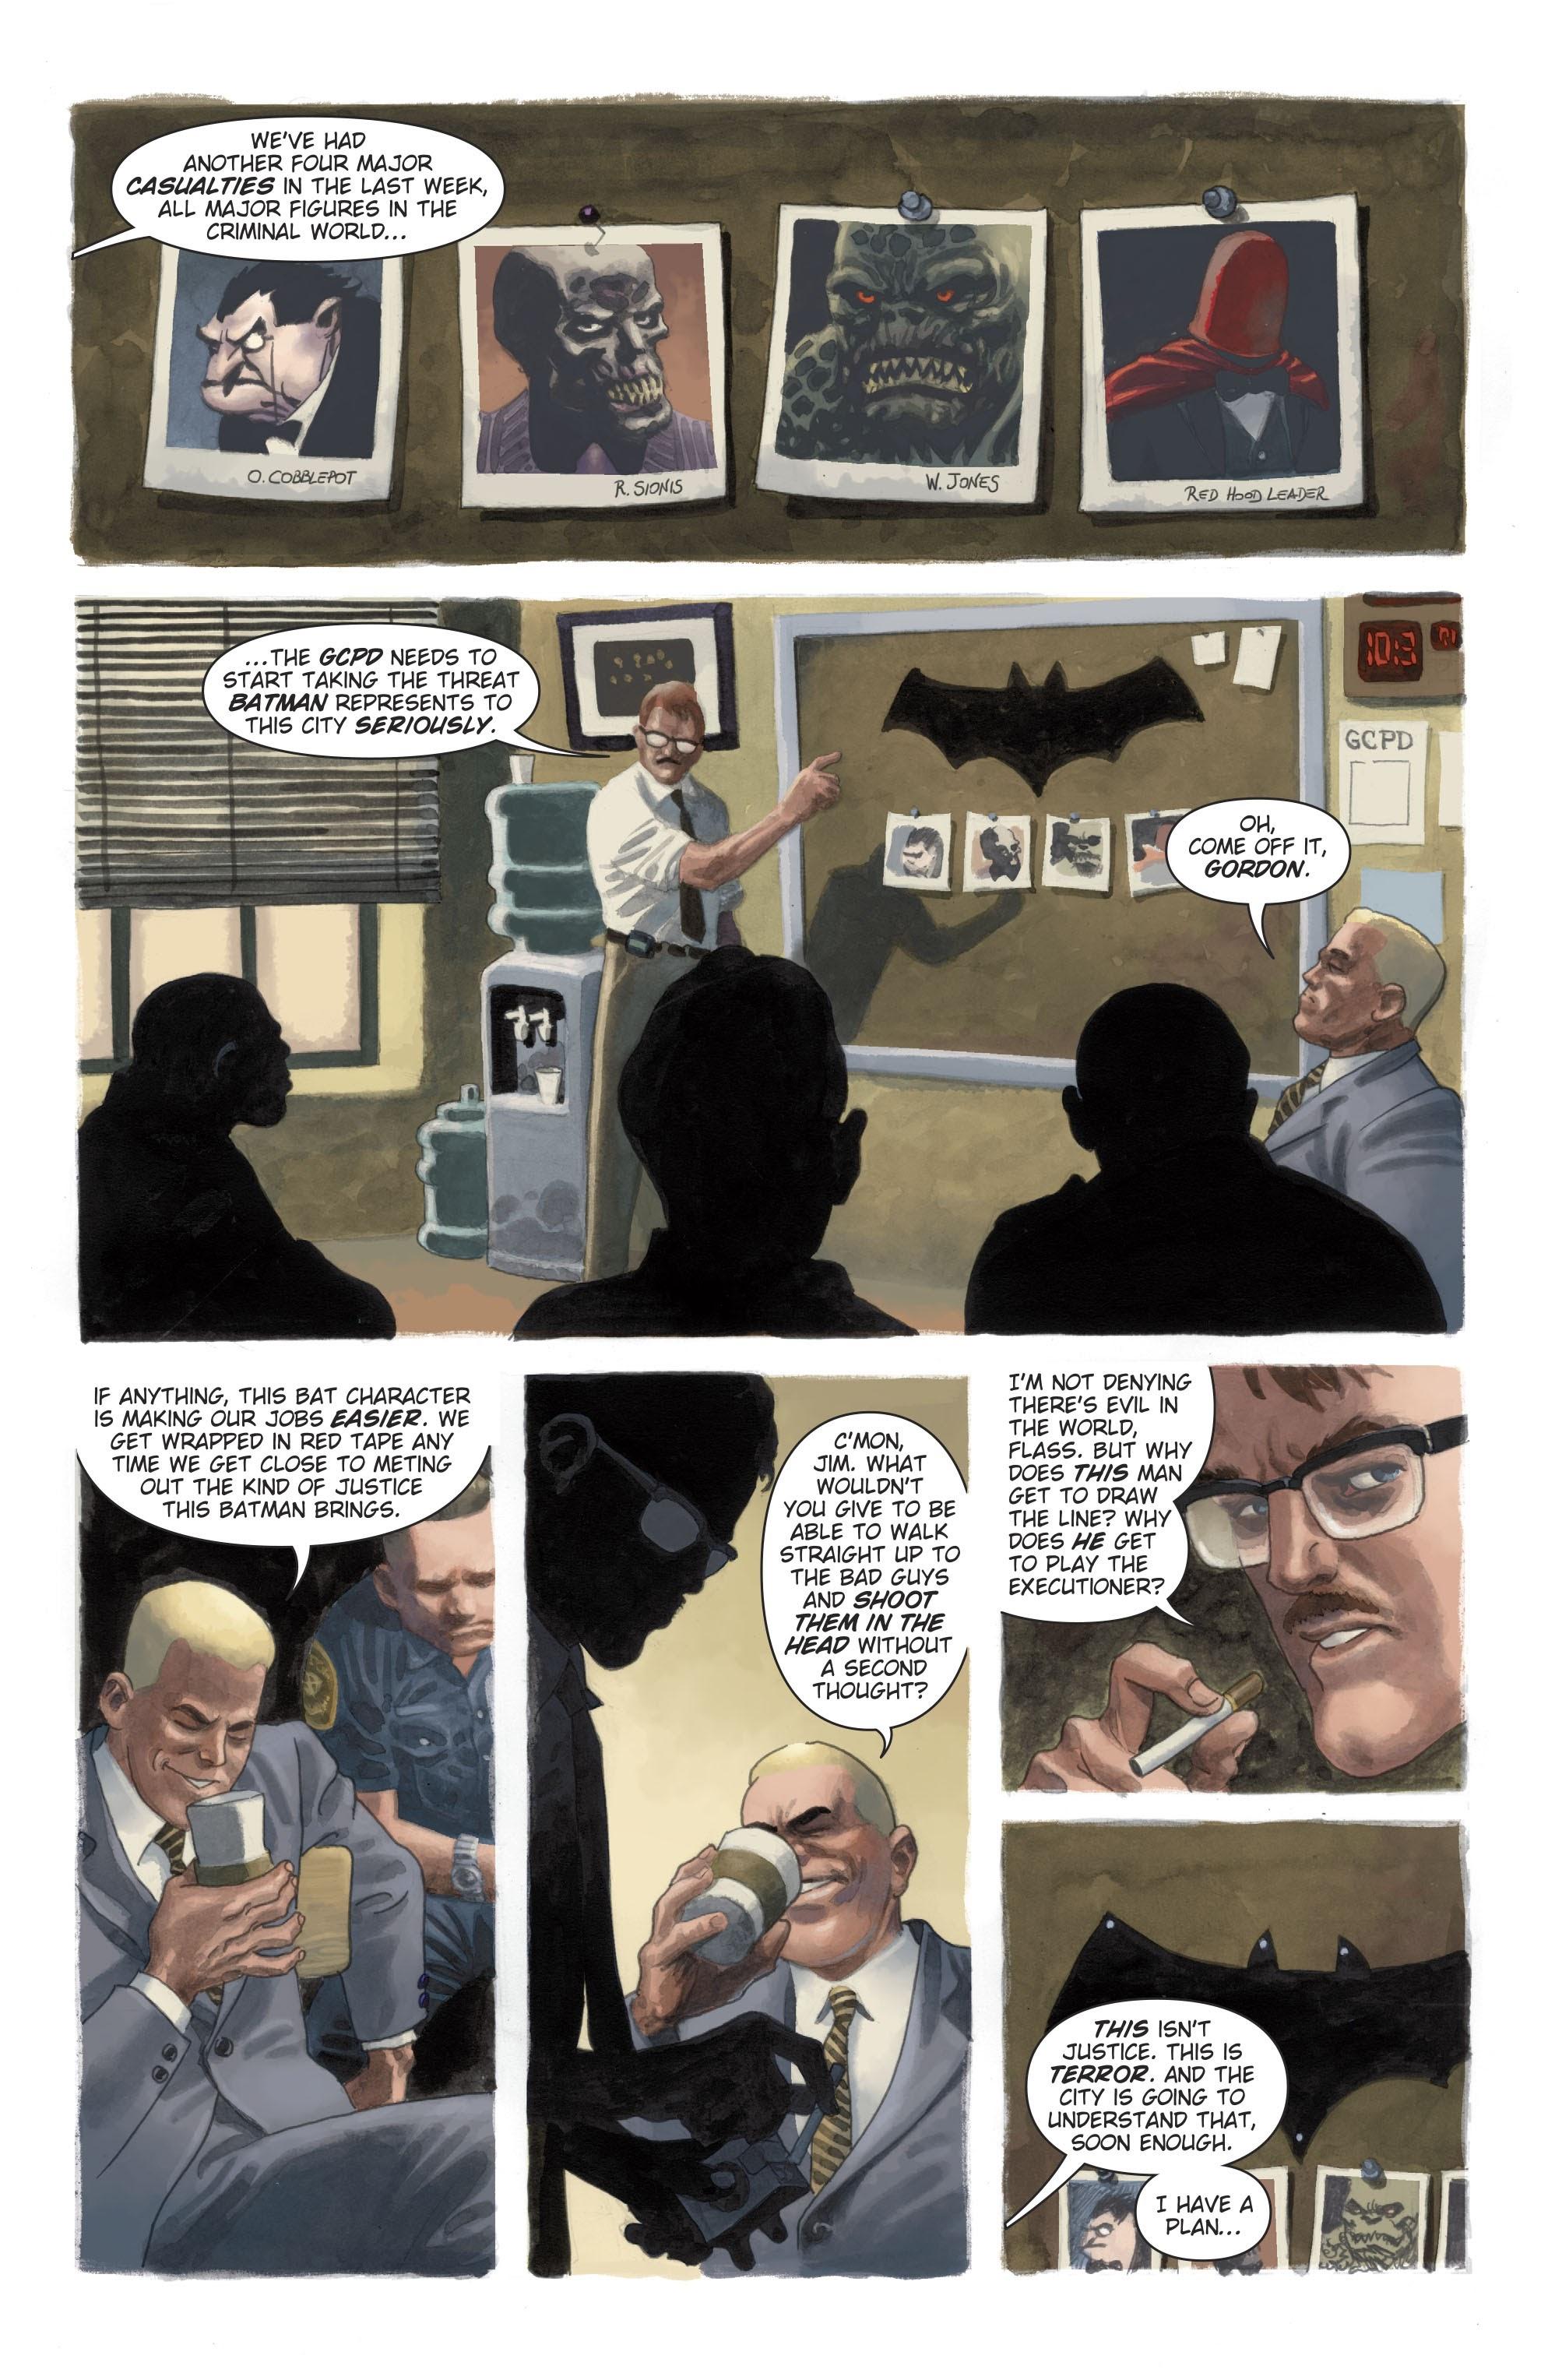 Psychology of Bruce Wayne GjOTP4KIY9Us2mWgsk5RKeHR9T4FvyIbc3Ur7sml2Nhmzk5BTZbowP1fX82LdU6SQXcuSrTg6pBfB7Mydj3EzXgrYDFKGLeAd1O5wjbl3XQvooCk4Cftg0JWFl4LEPVF6UzW68IQX50=s0